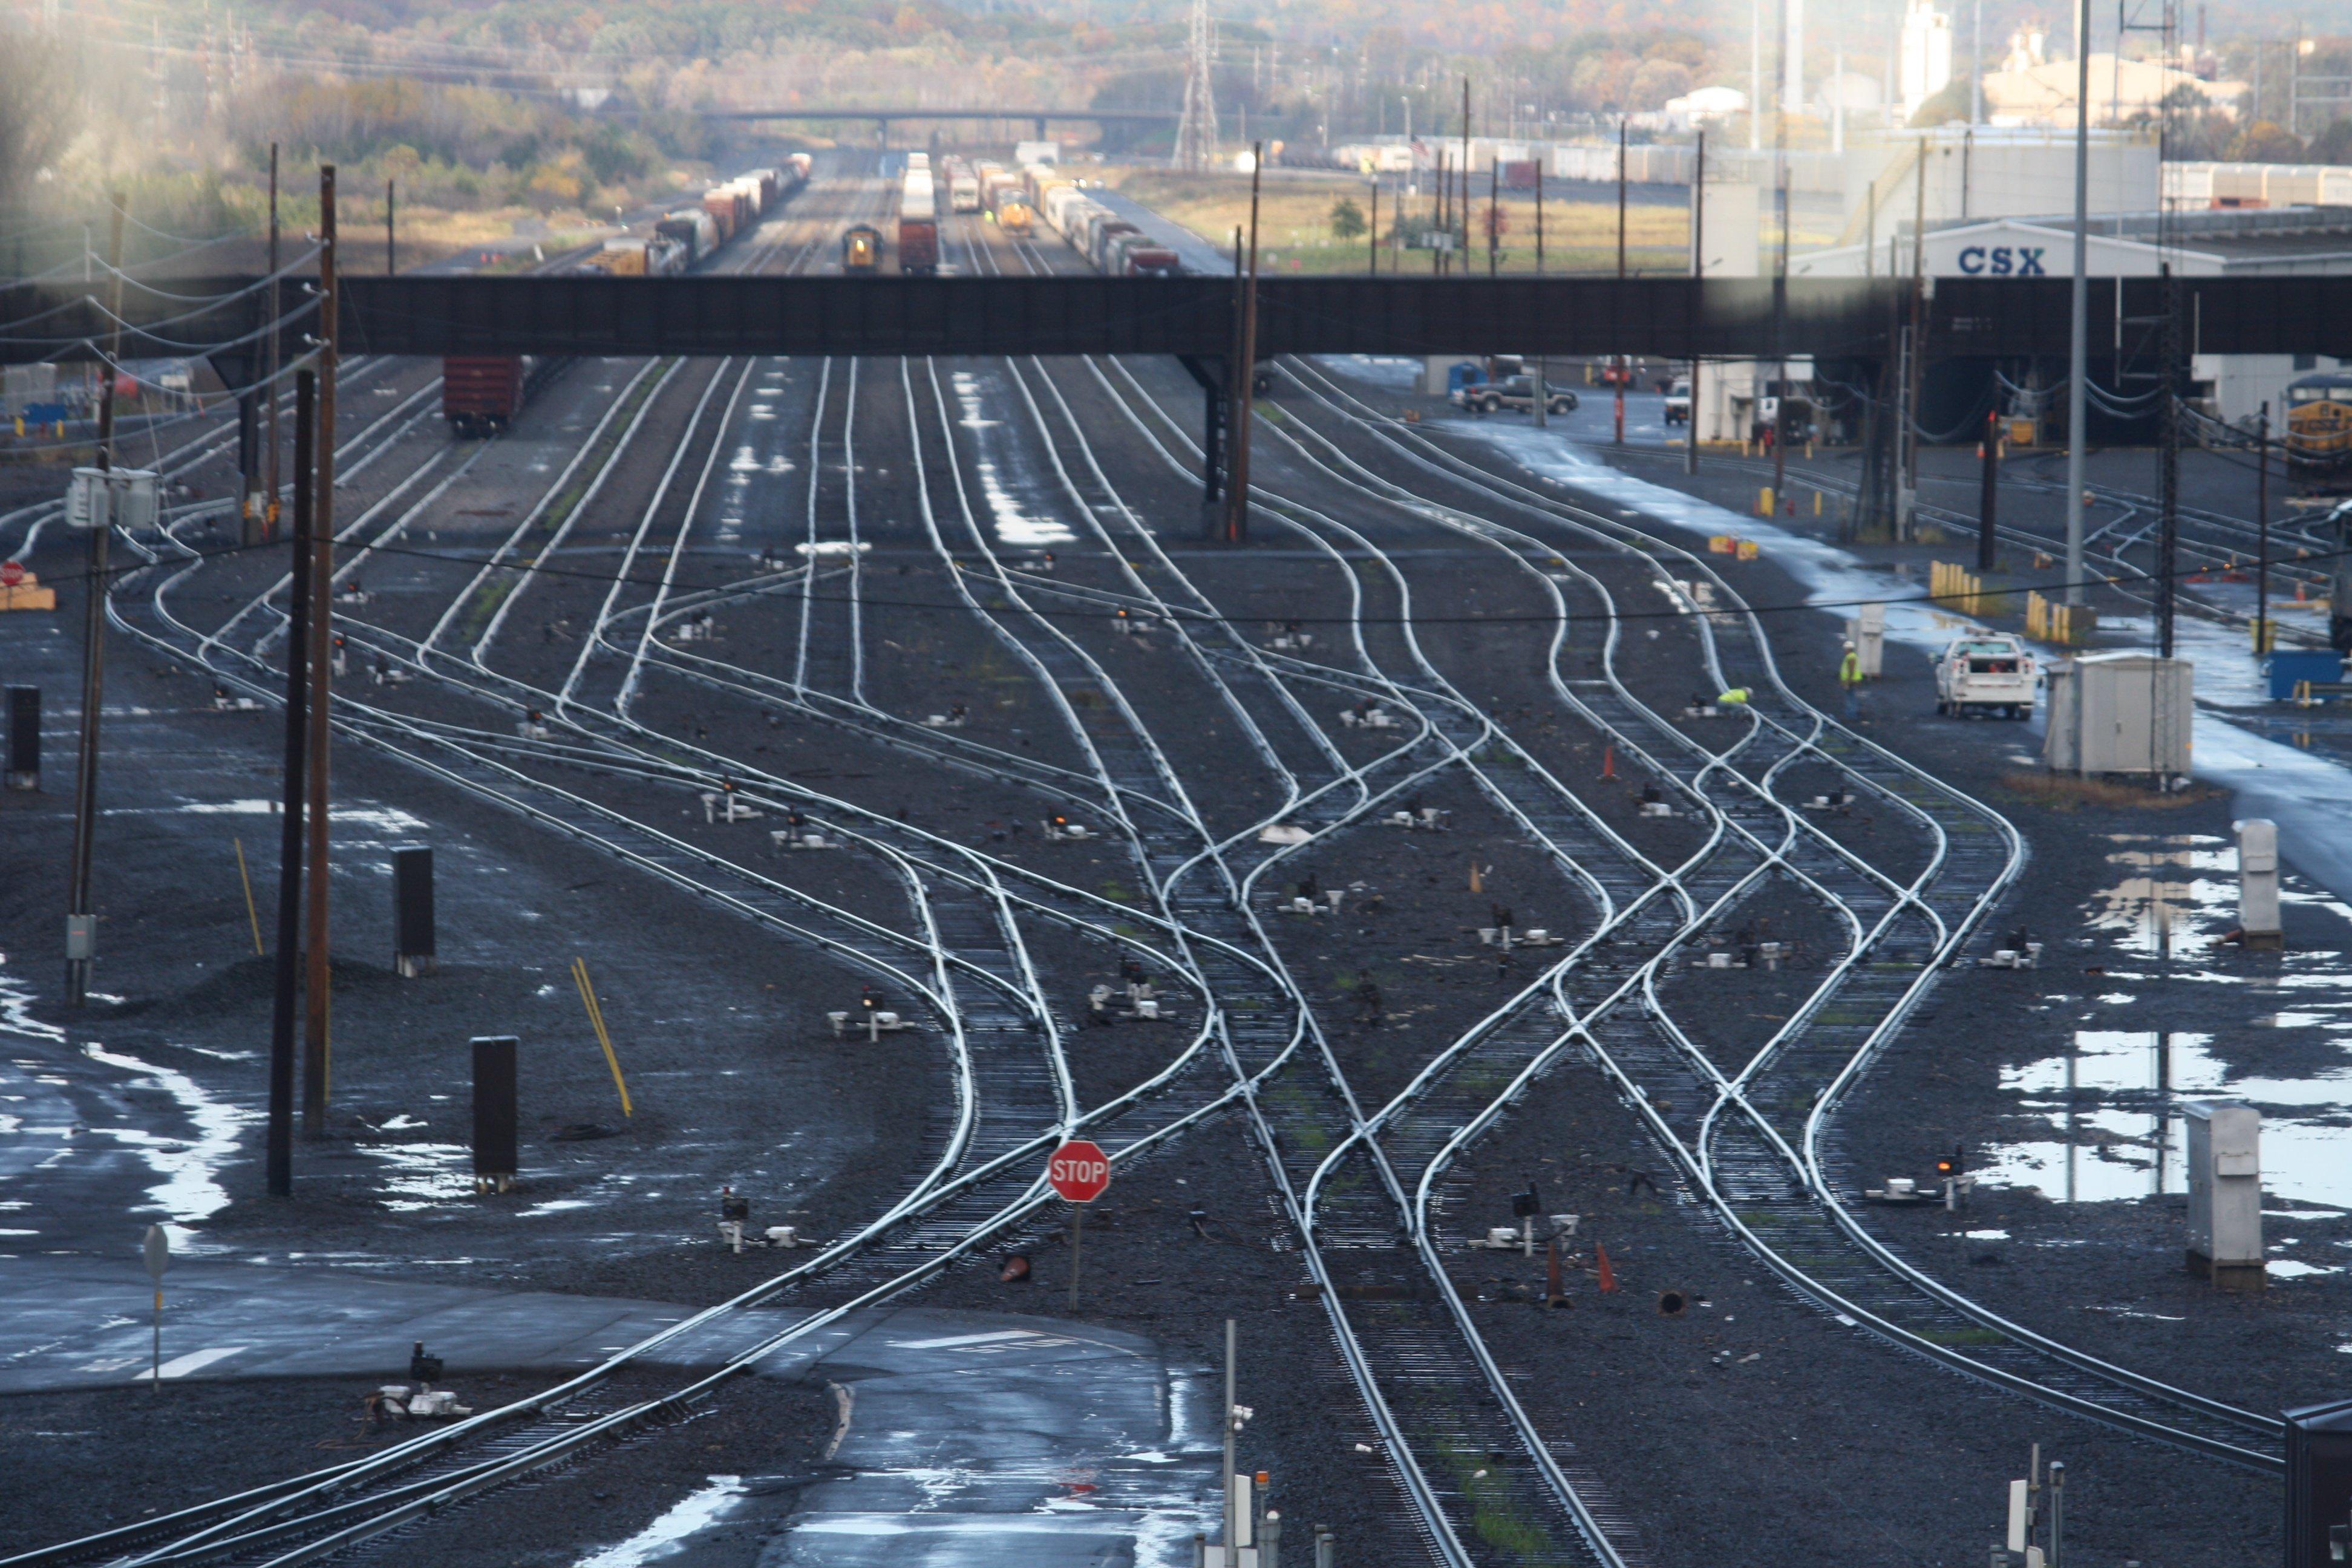 CSX_railroad_on_job_injury_FELA.jpg